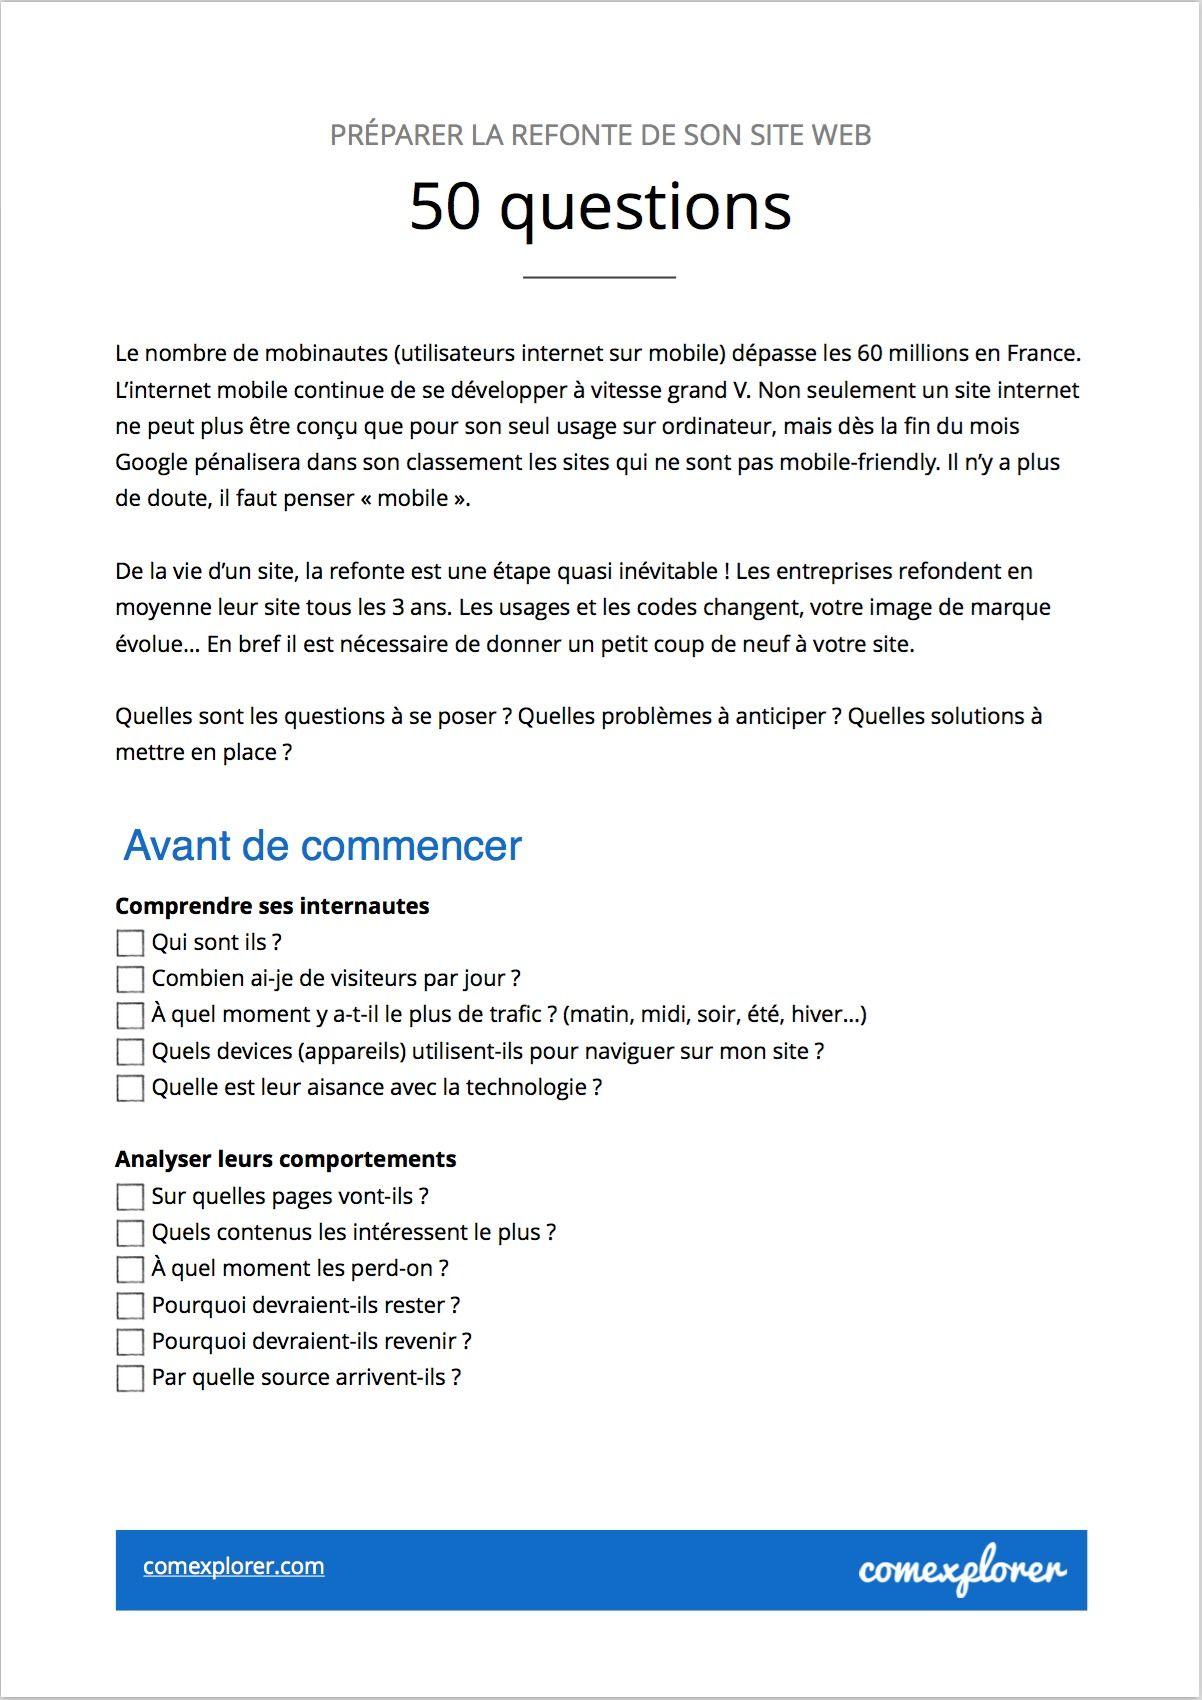 Checklist refonte site web